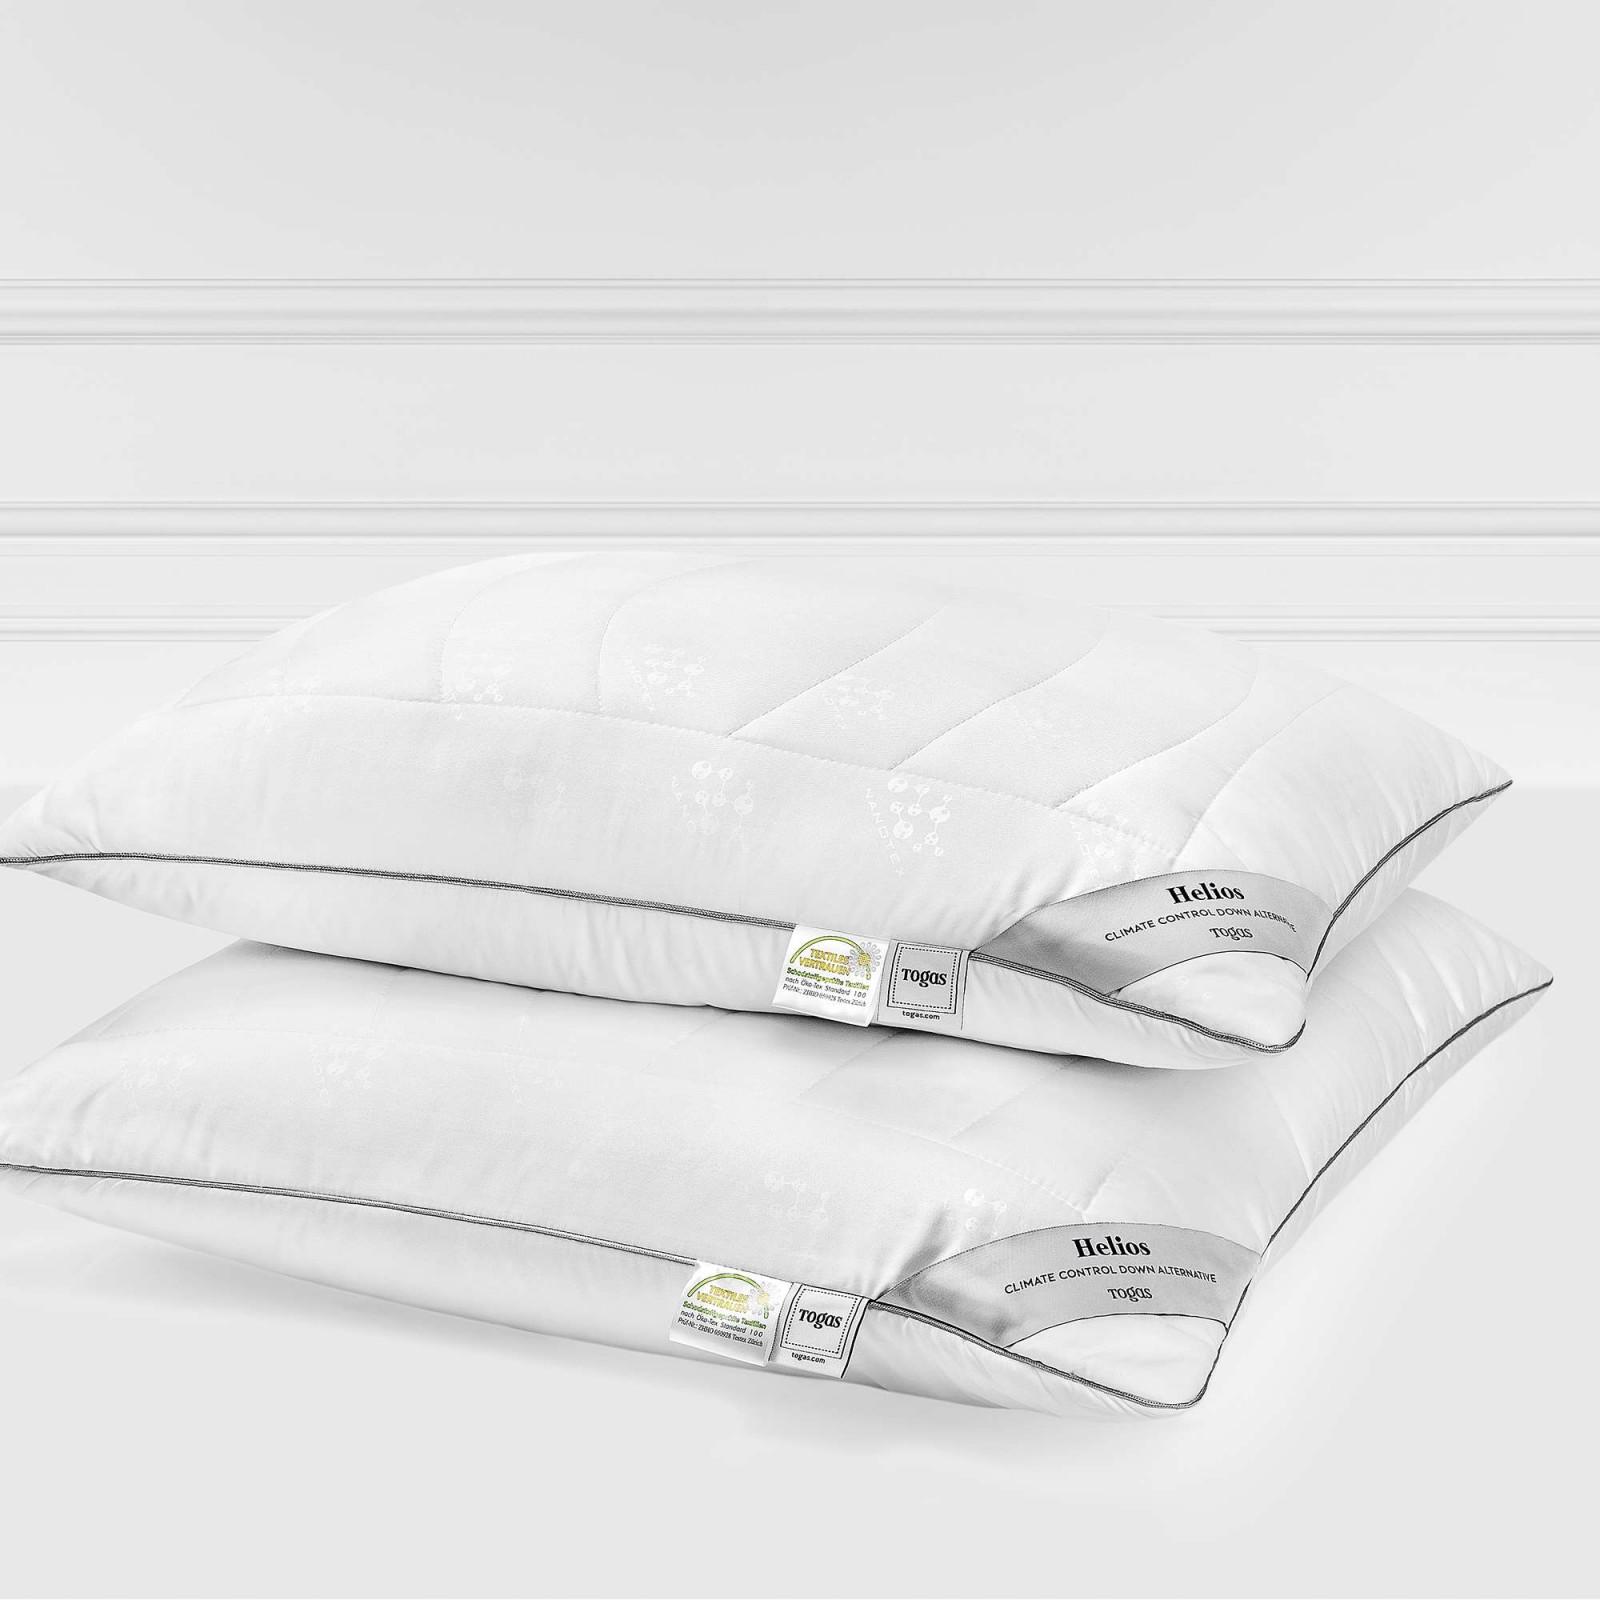 Подушки Togas Подушка Гелиос Средняя (50х70) одеяла togas одеяло гелиос 220х240 см